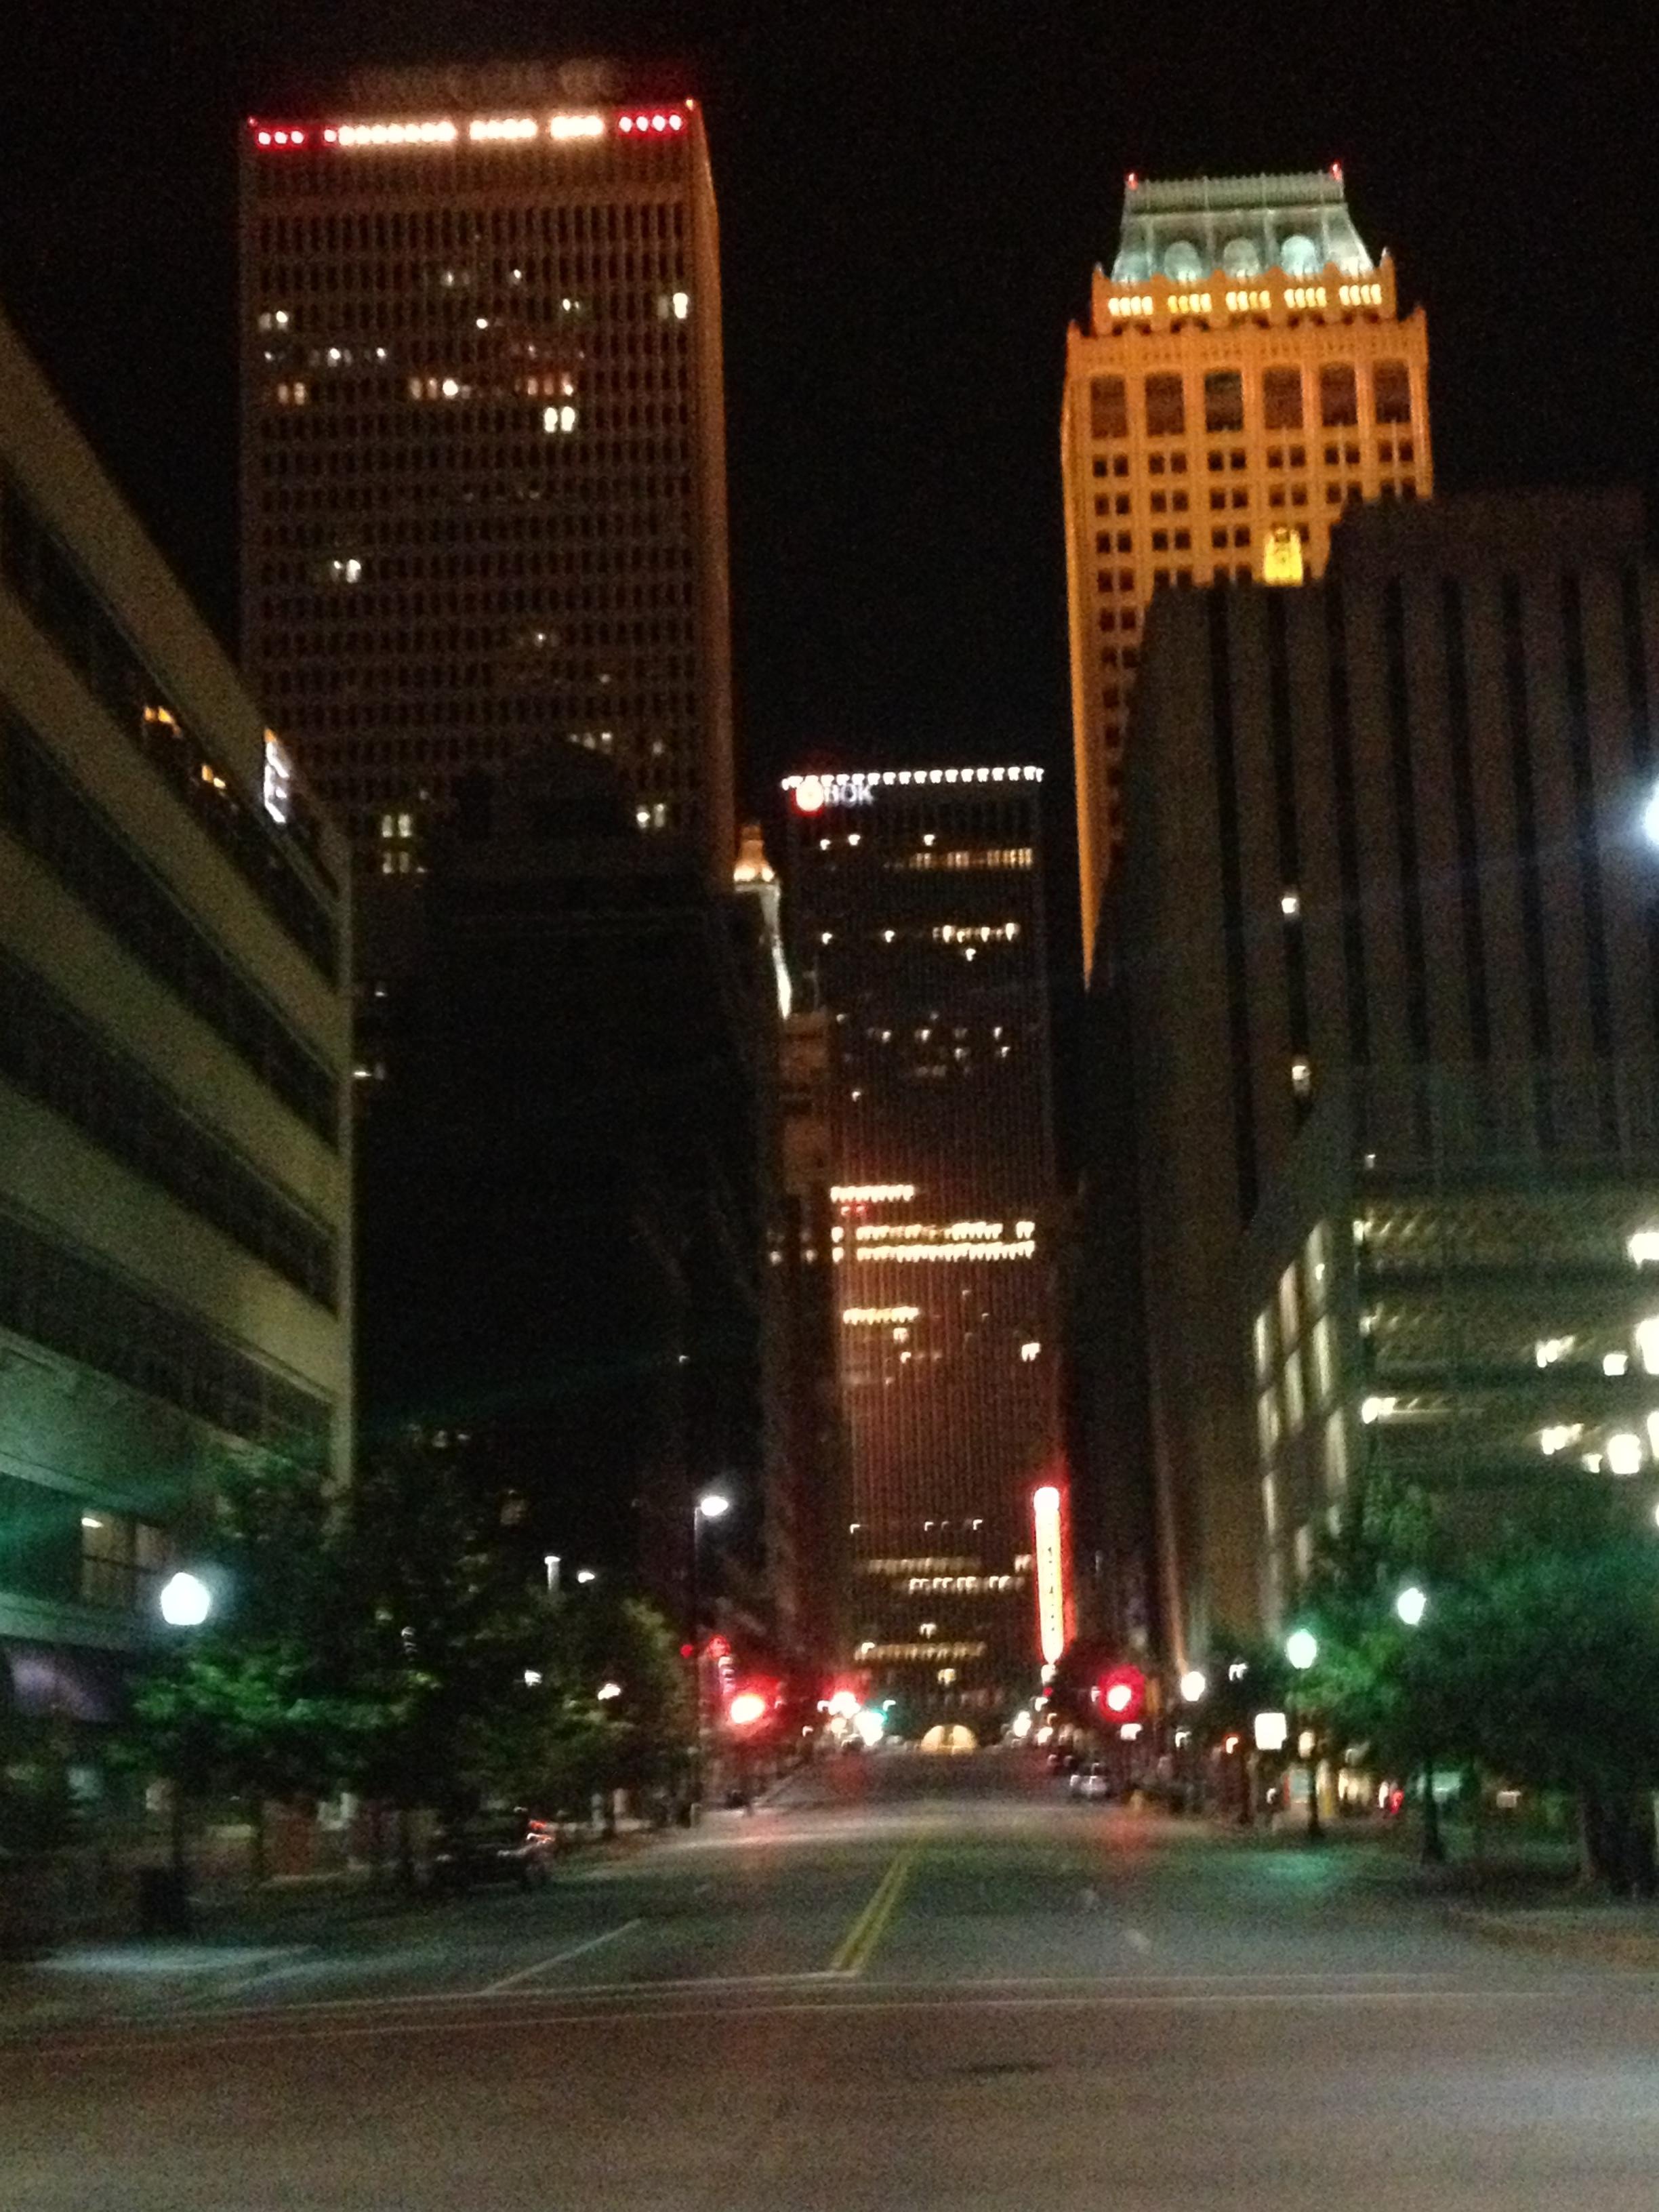 Our City Tulsa, Oklahoma